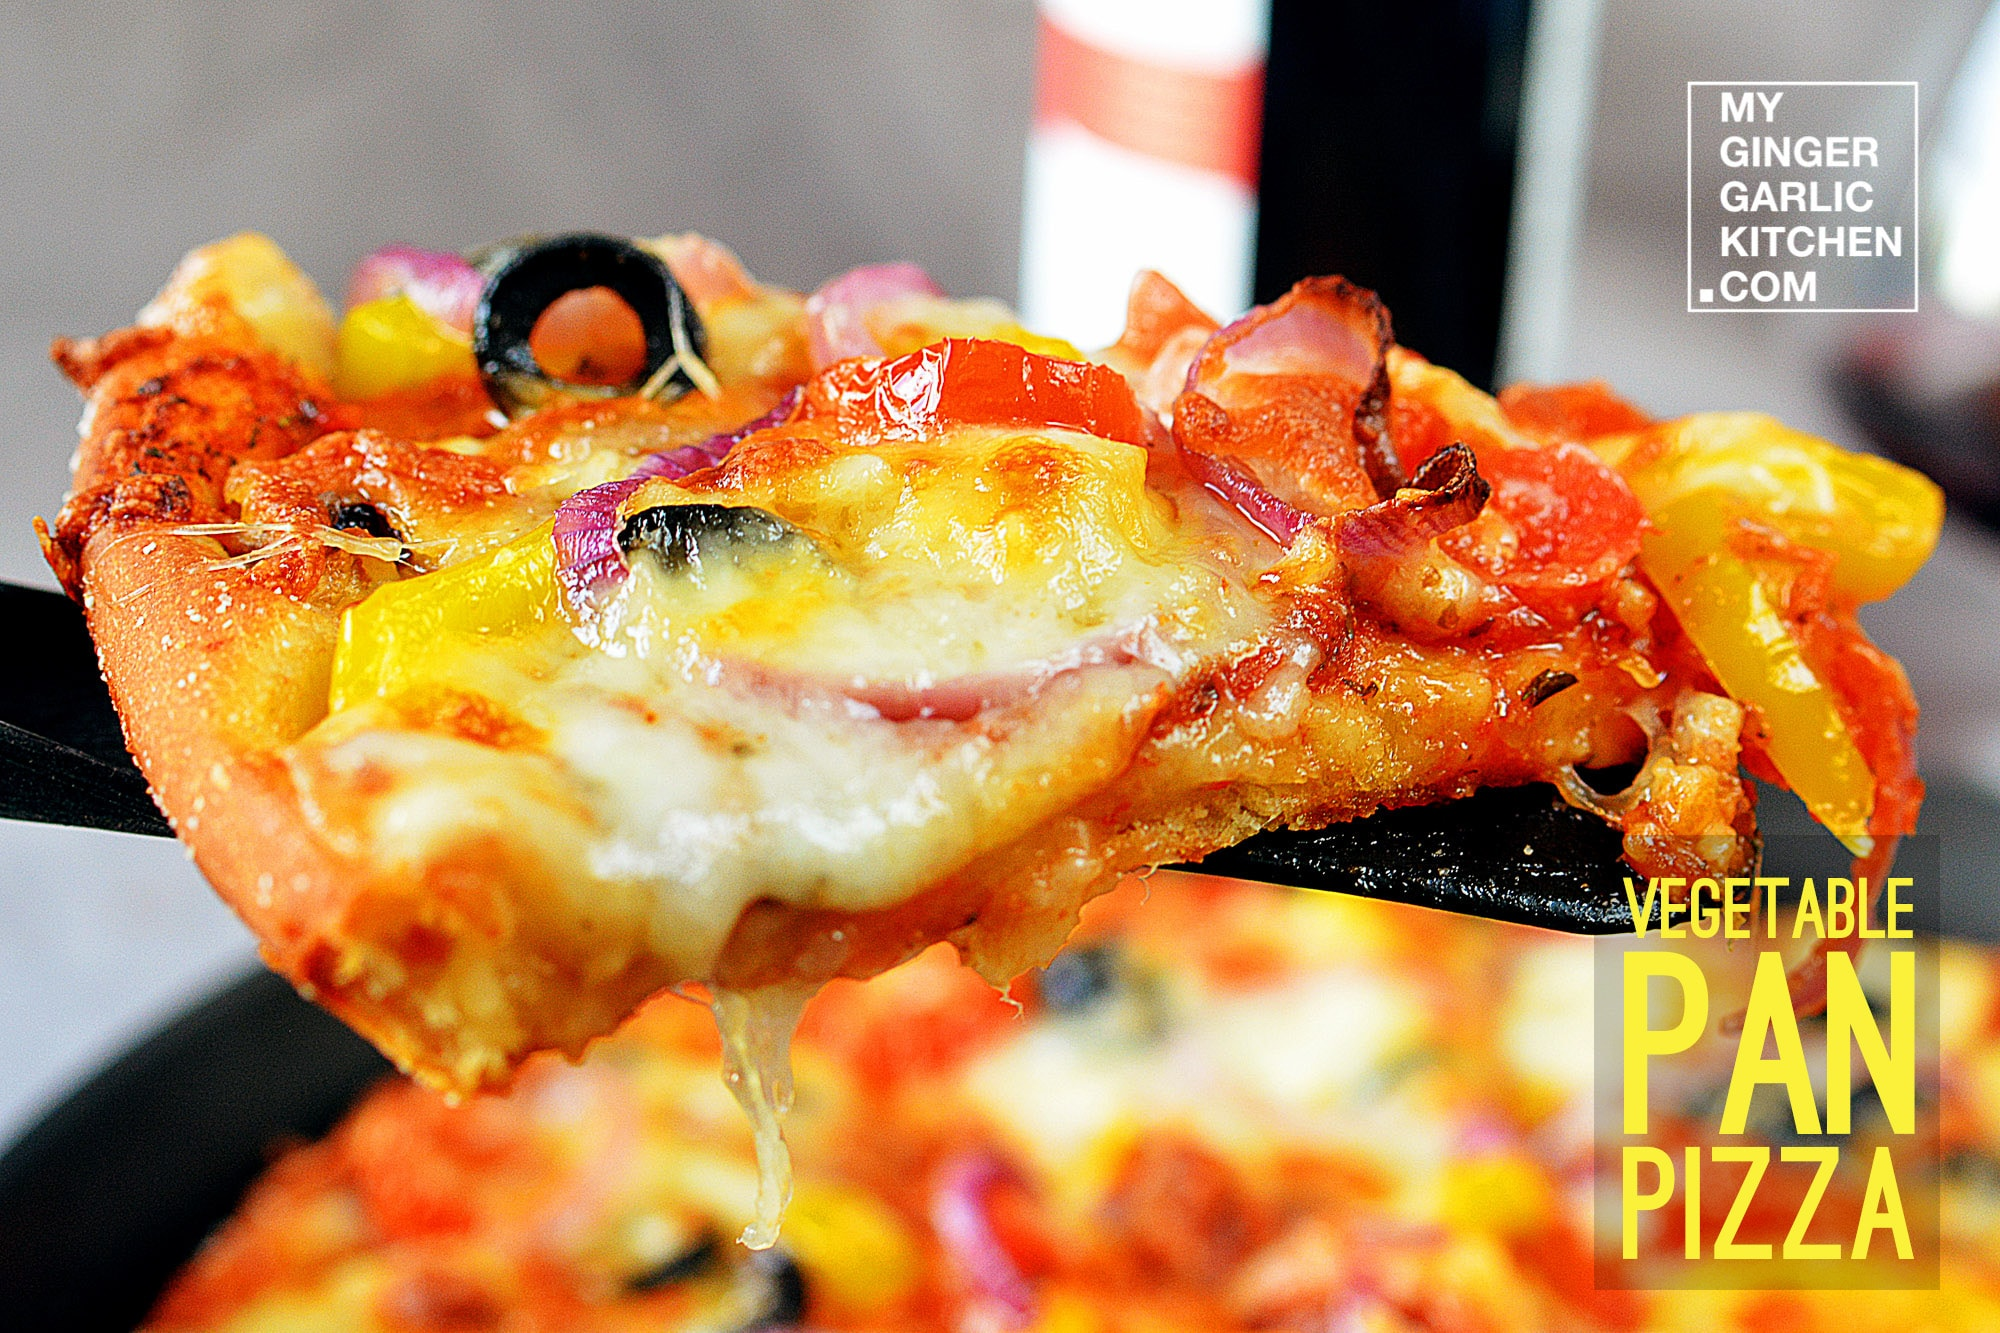 Image - recipe vegetable pan pizza anupama paliwal my ginger garlic kitchen 4 copy